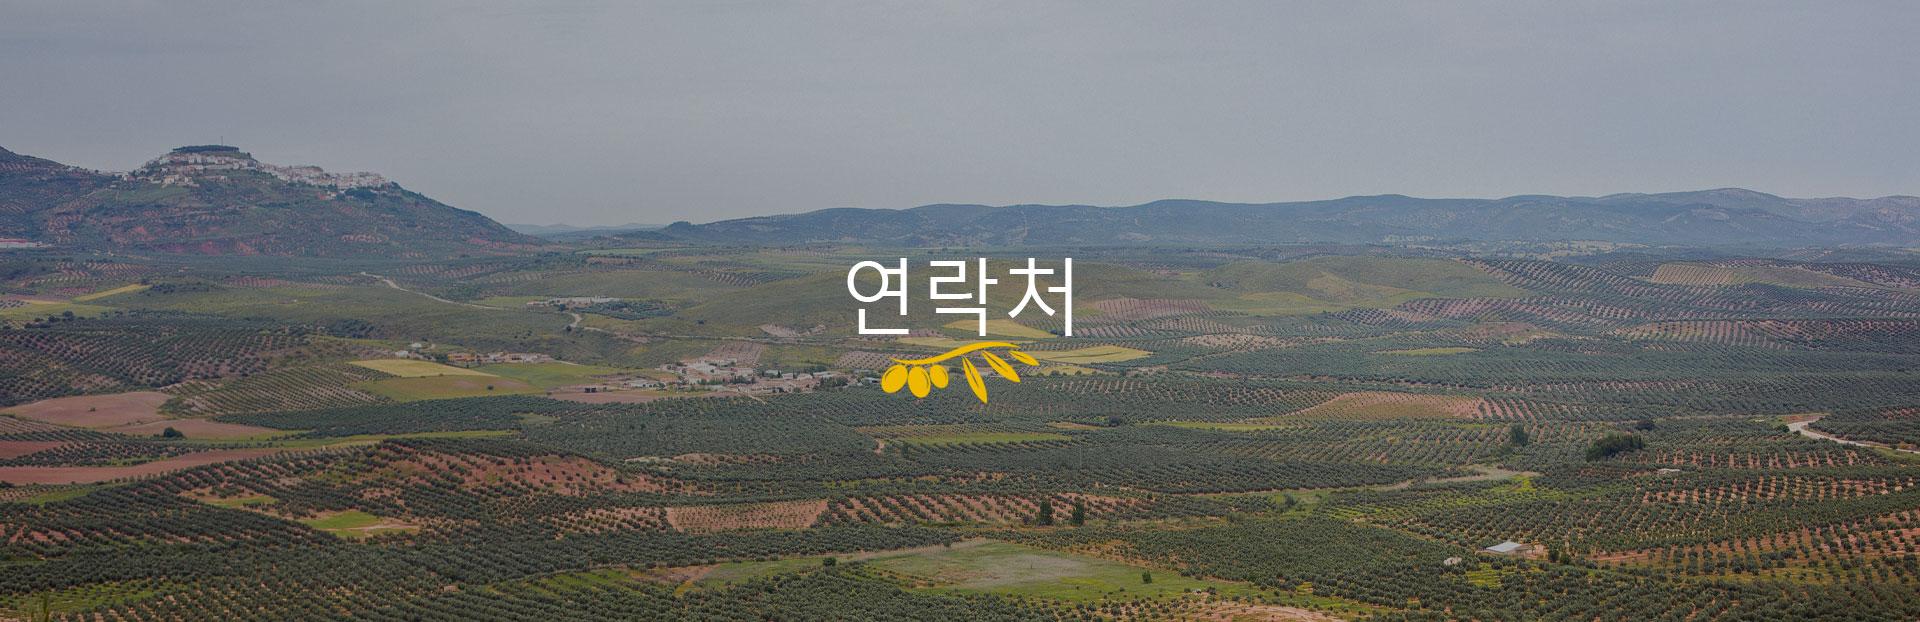 AceitesUnicos_slider_contacto_koreano